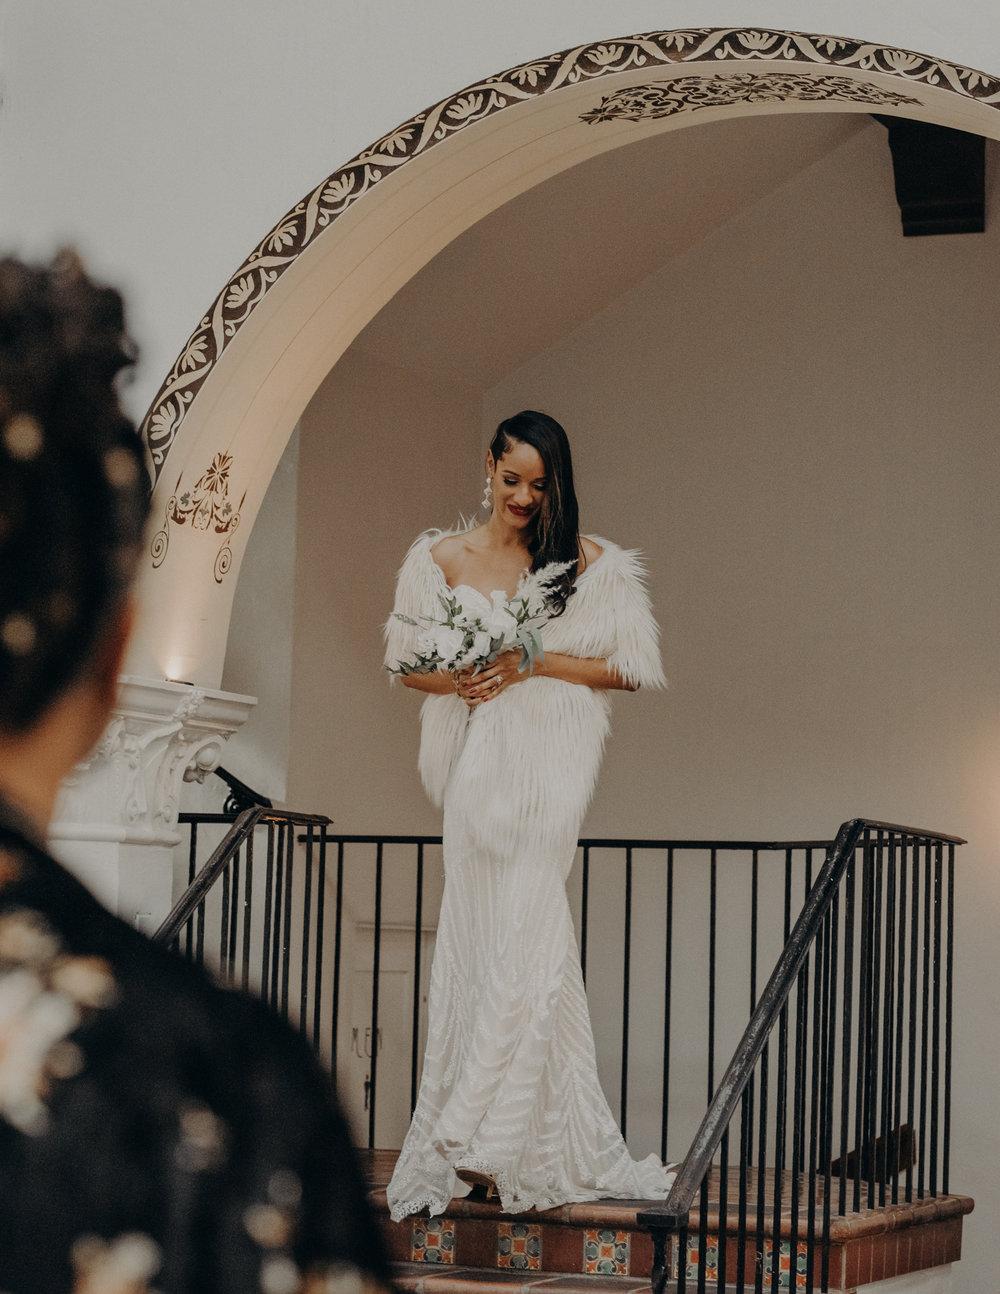 Wedding Photographer in Los Angeles - Ebell of Long Beach Wedding - LGBTQ weddings - lesbian wedding - IsaiahAndTaylor.com-089.jpg